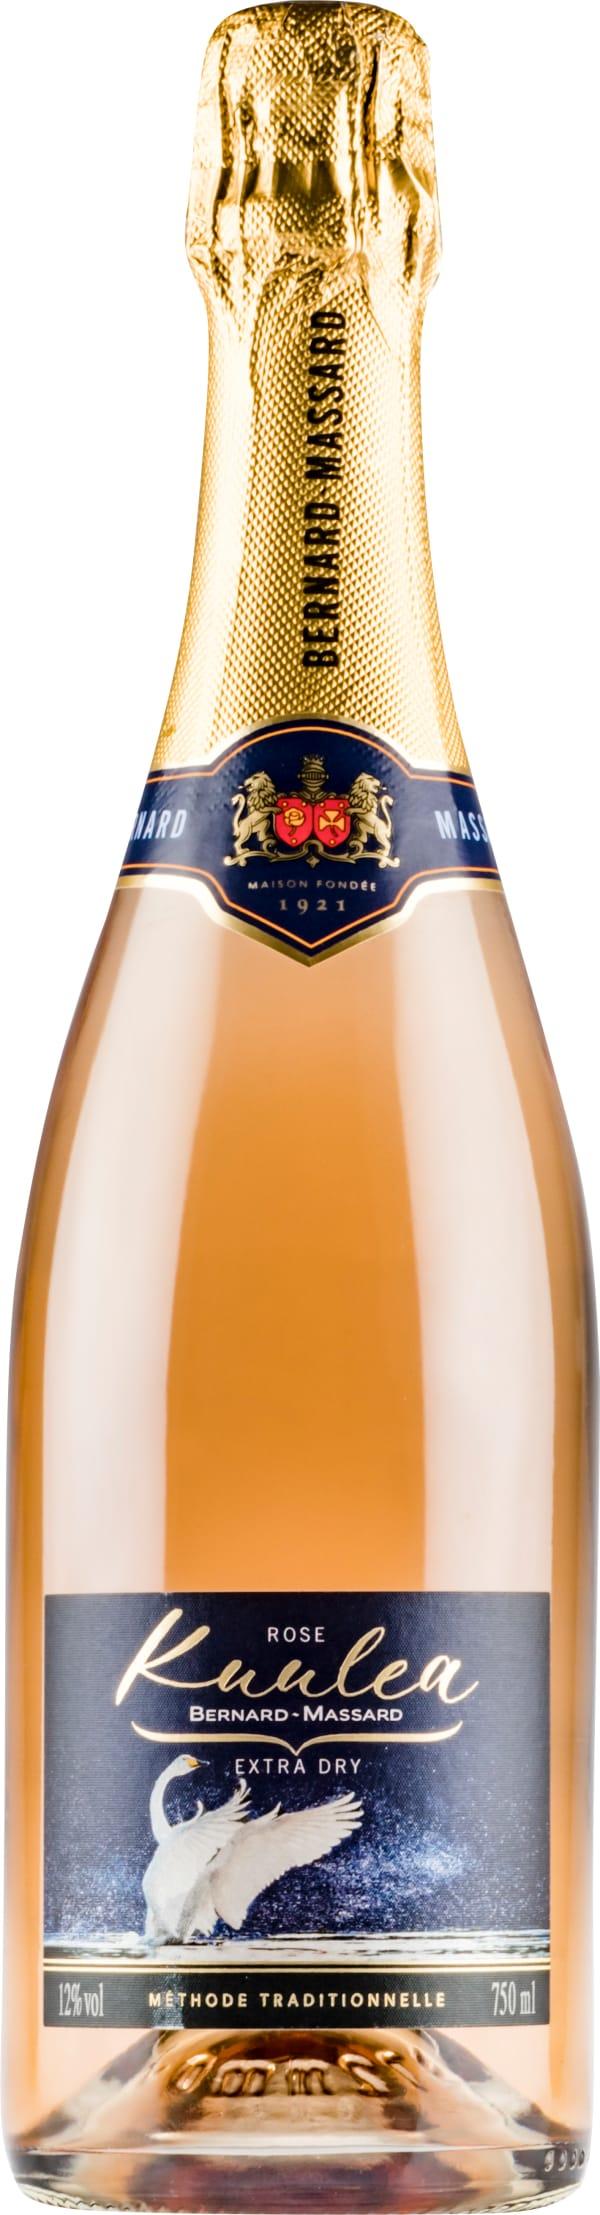 Bernard-Massard Kuulea Rosé Extra Dry